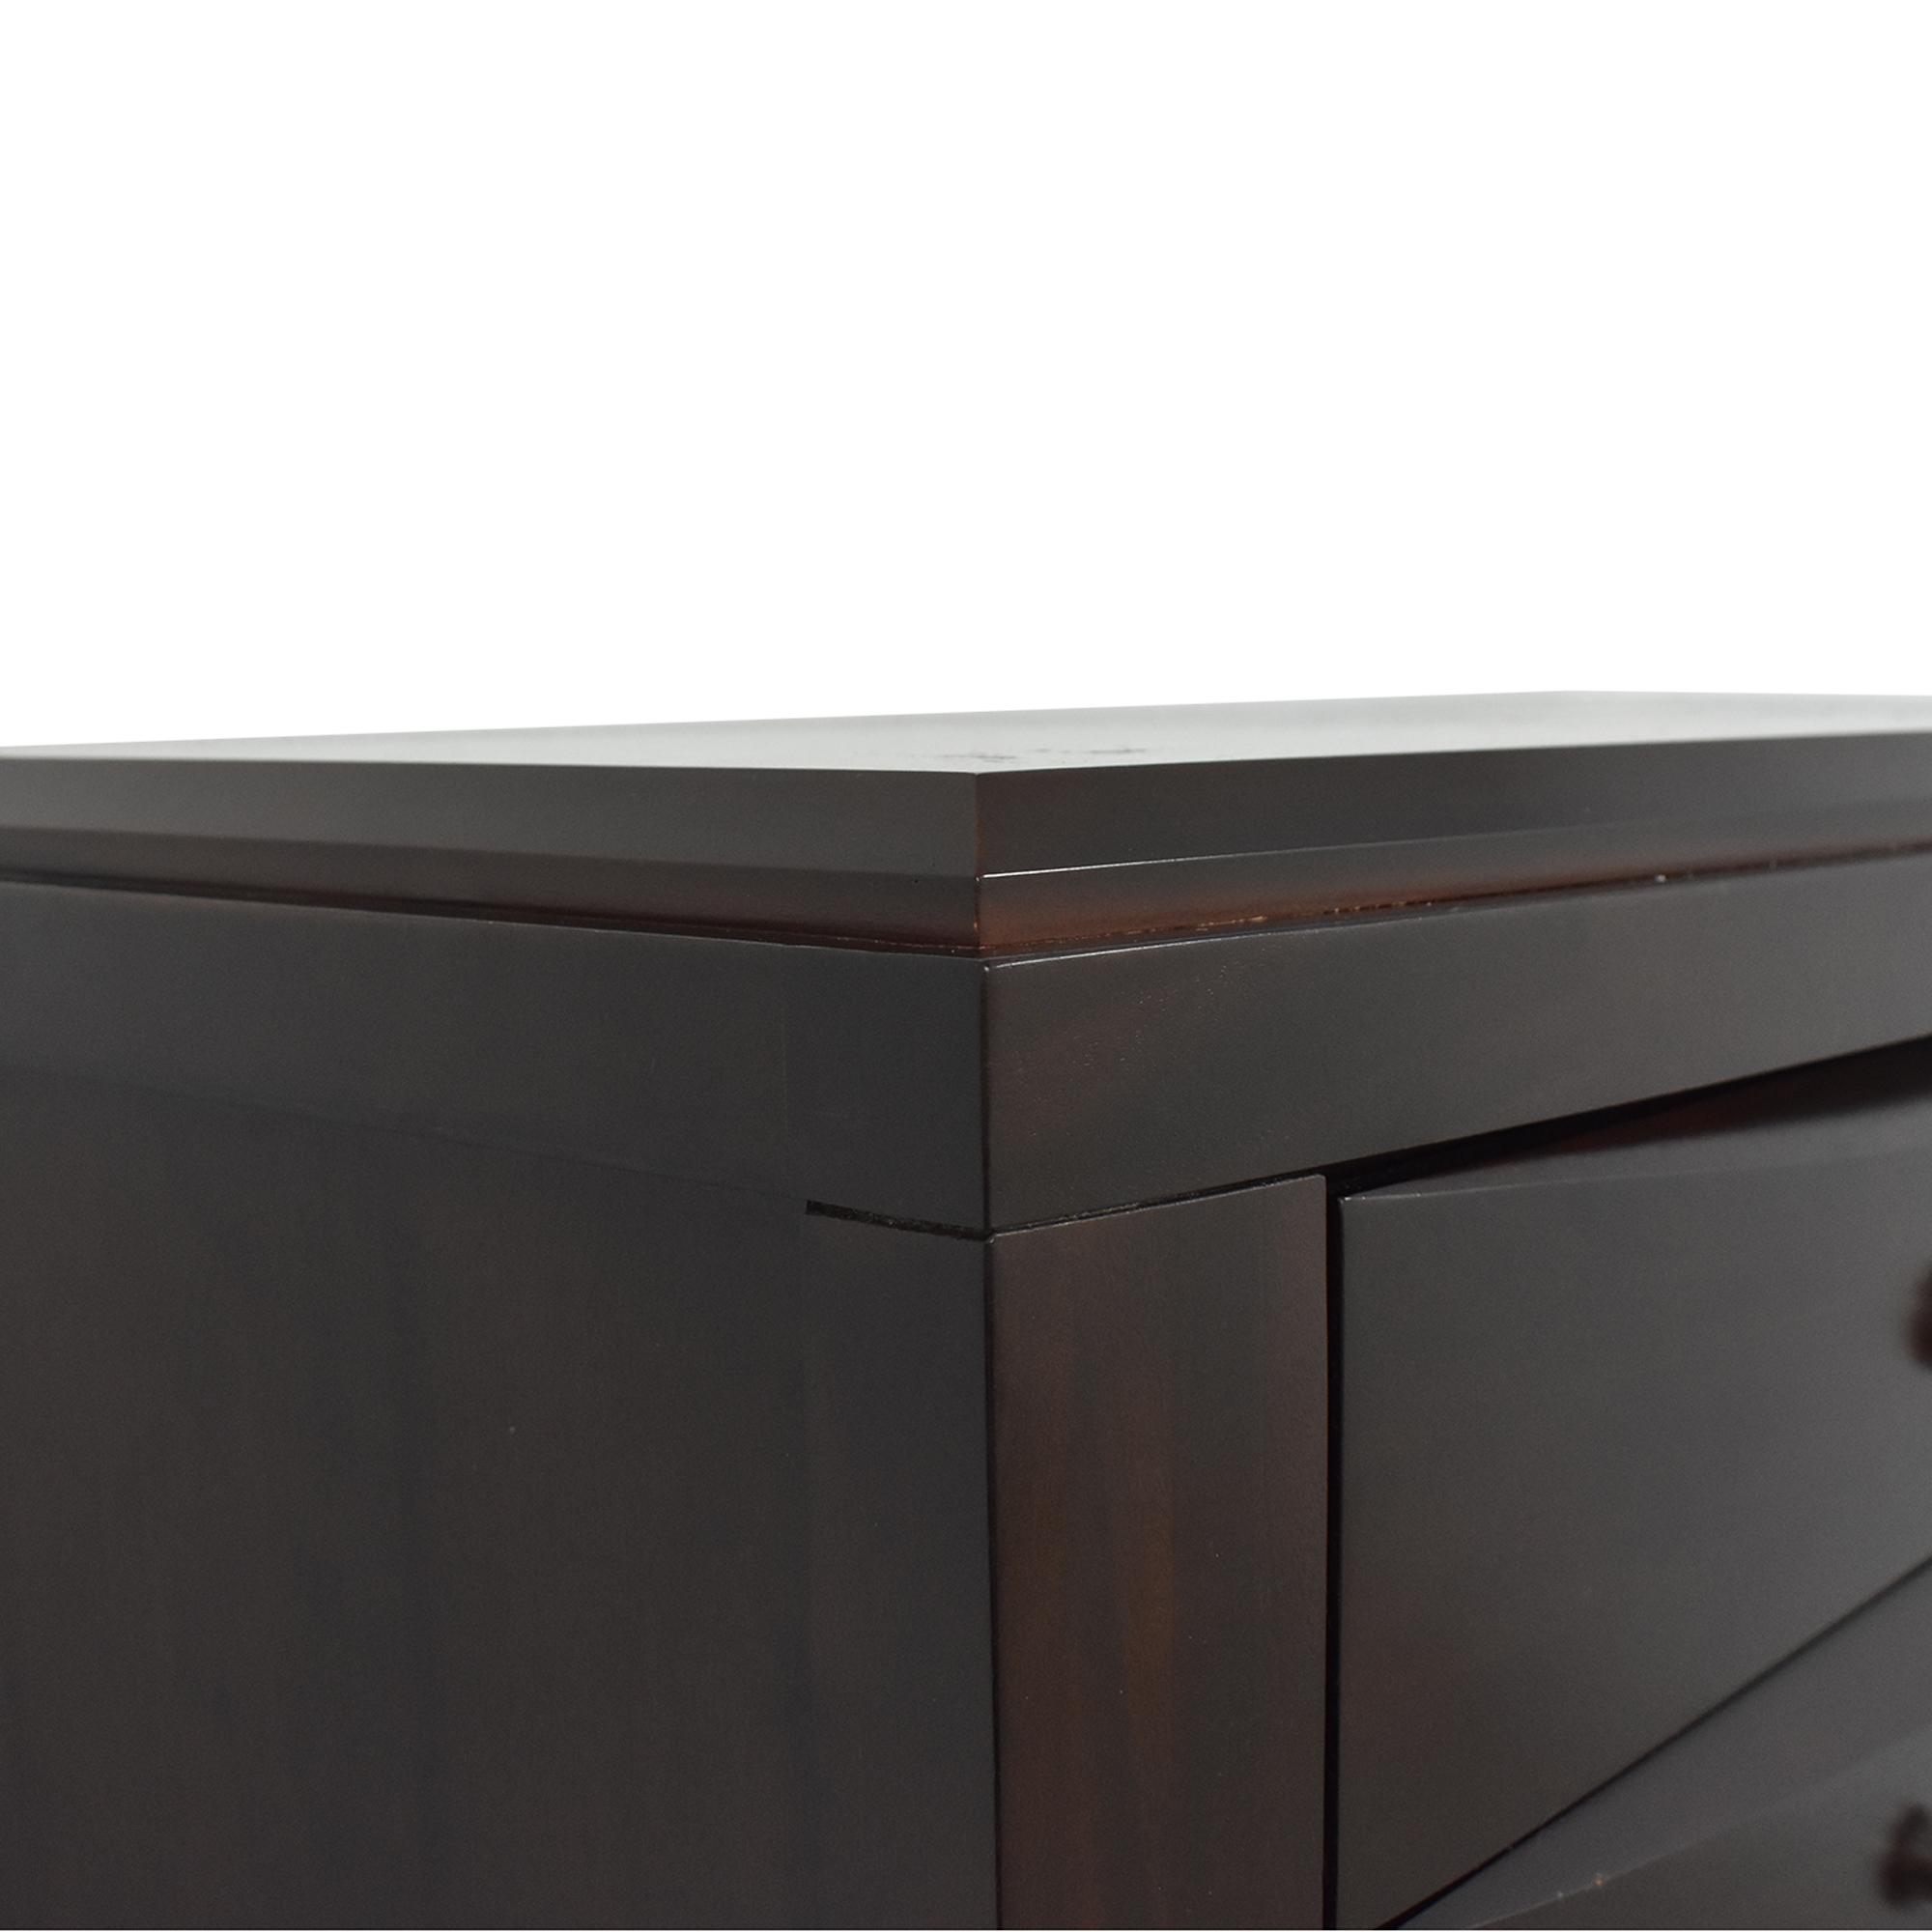 Casana Furniture Casana Rodea Nine Drawer Dresser used